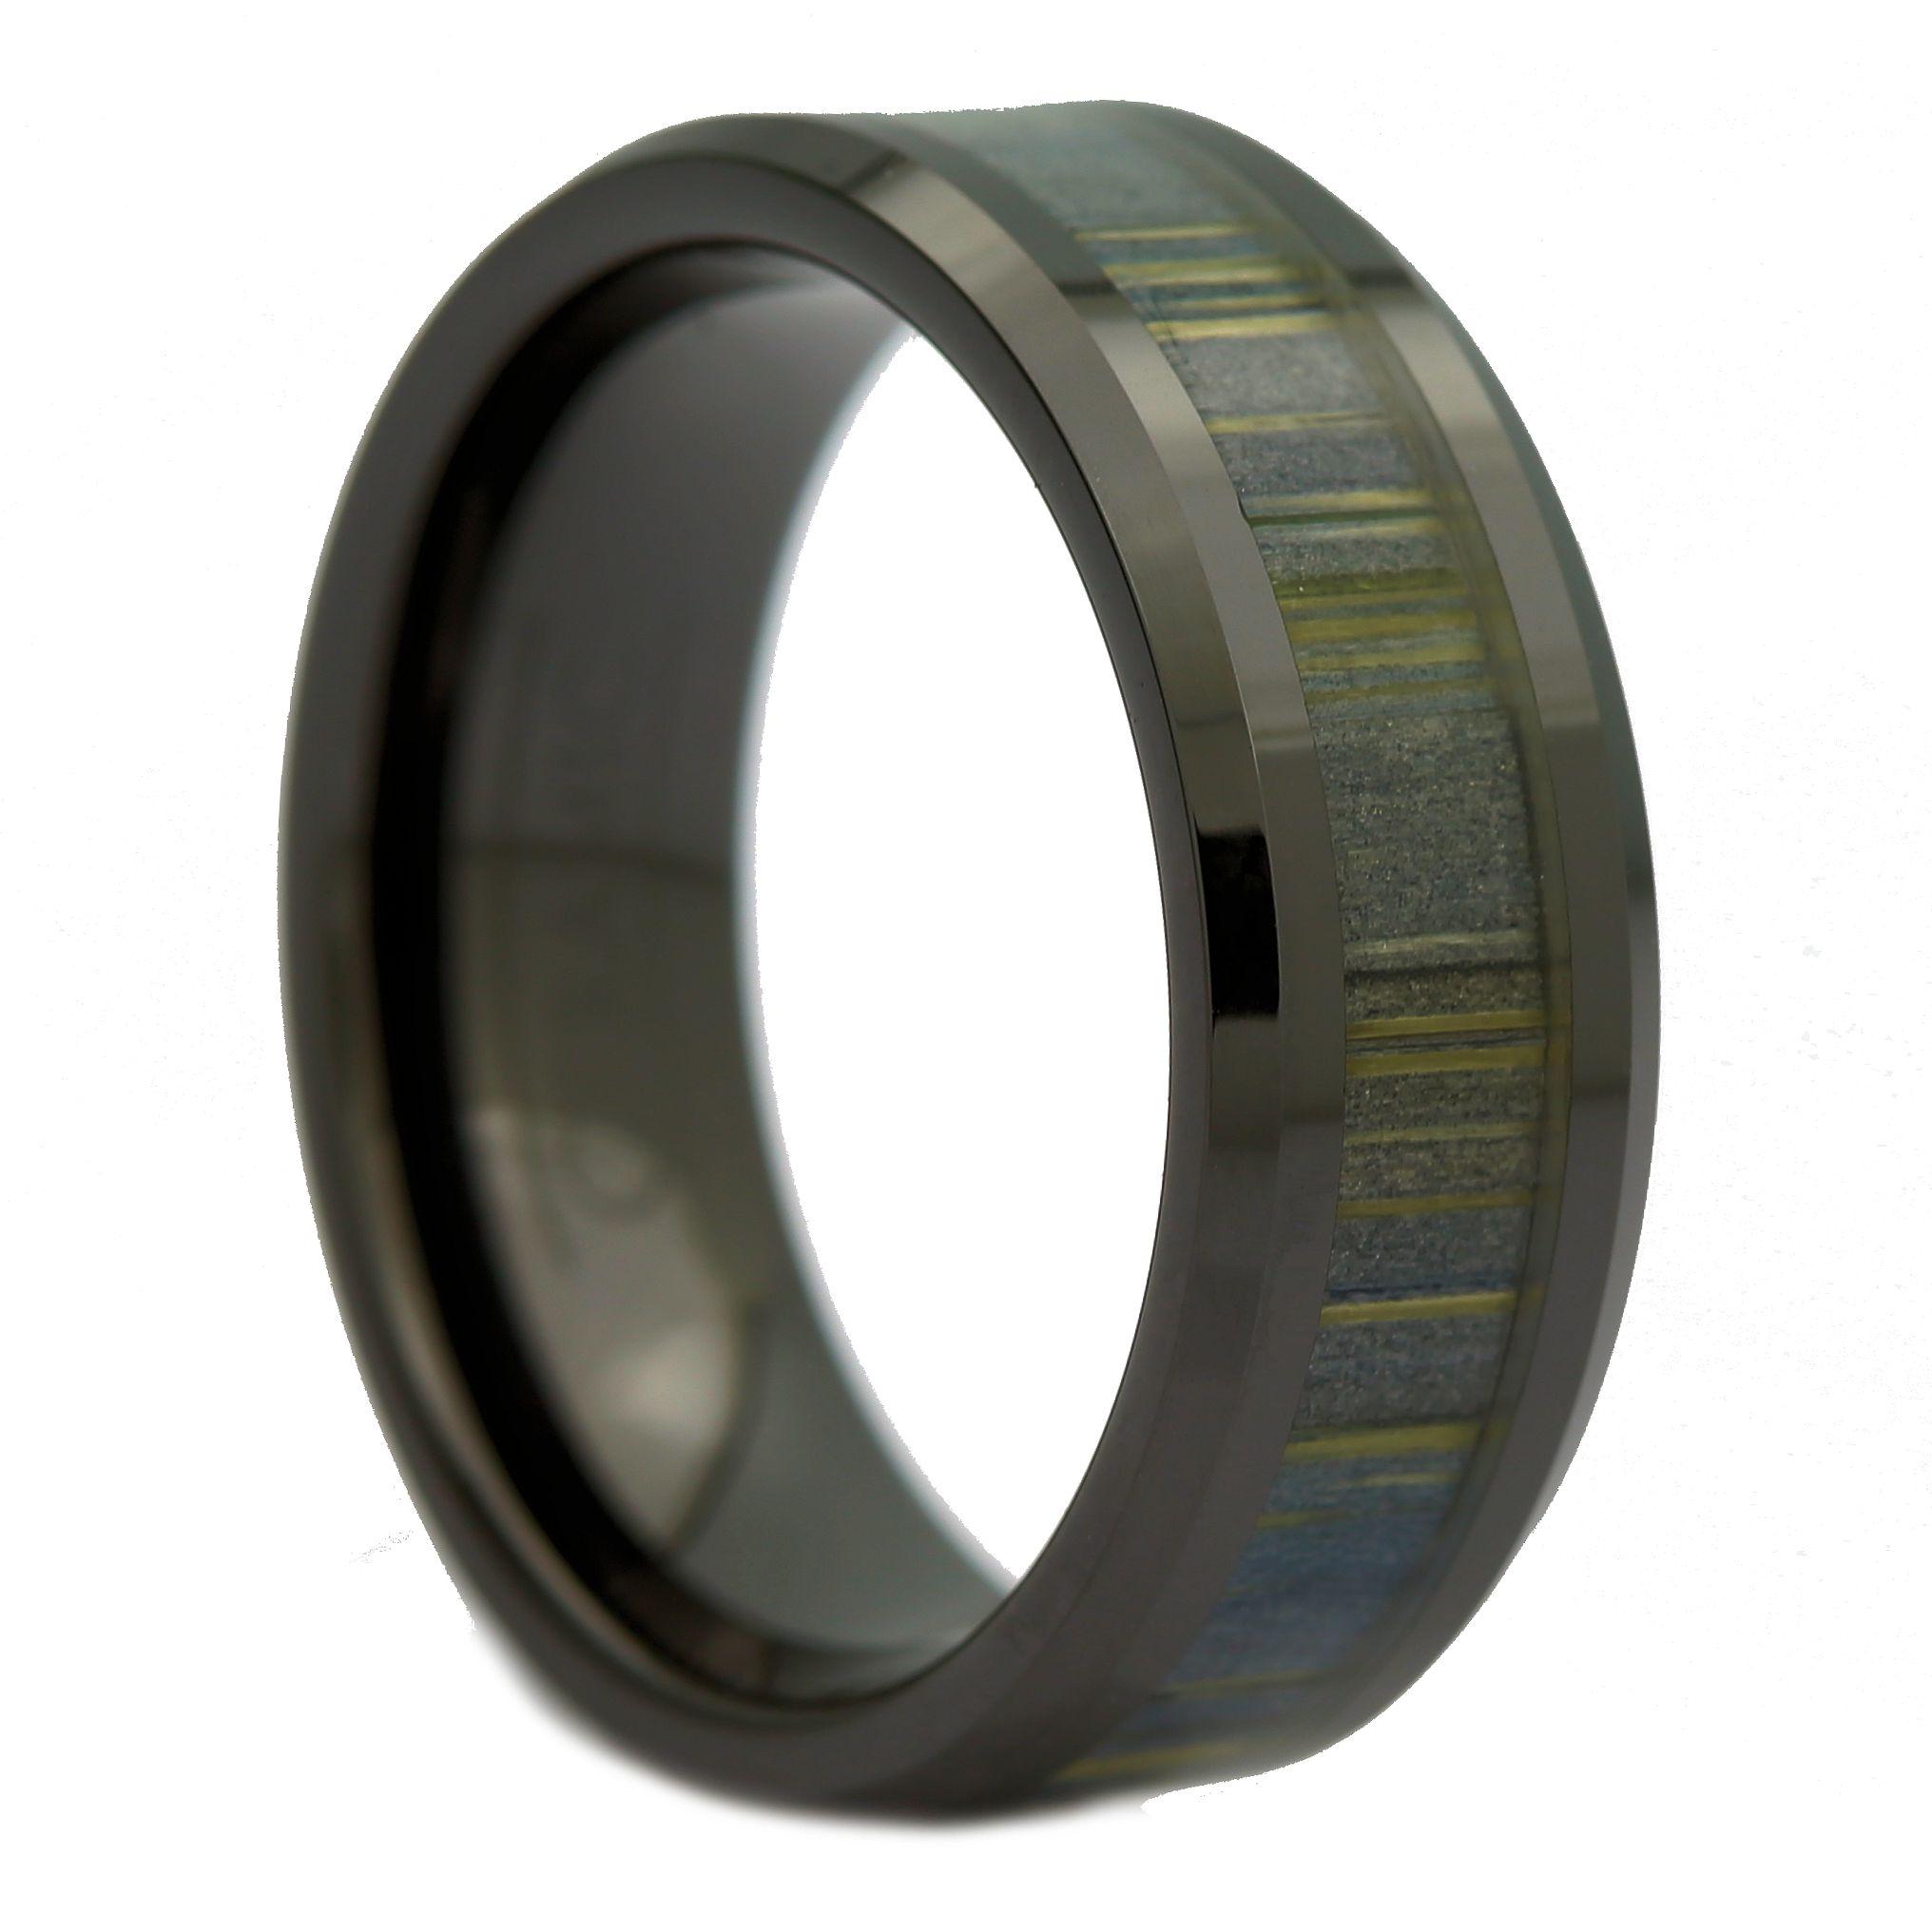 8mm Black Ceramic Ring Inlay Made From Zebra Wood Wedding Band: Wood Wedding Band Made At Websimilar.org